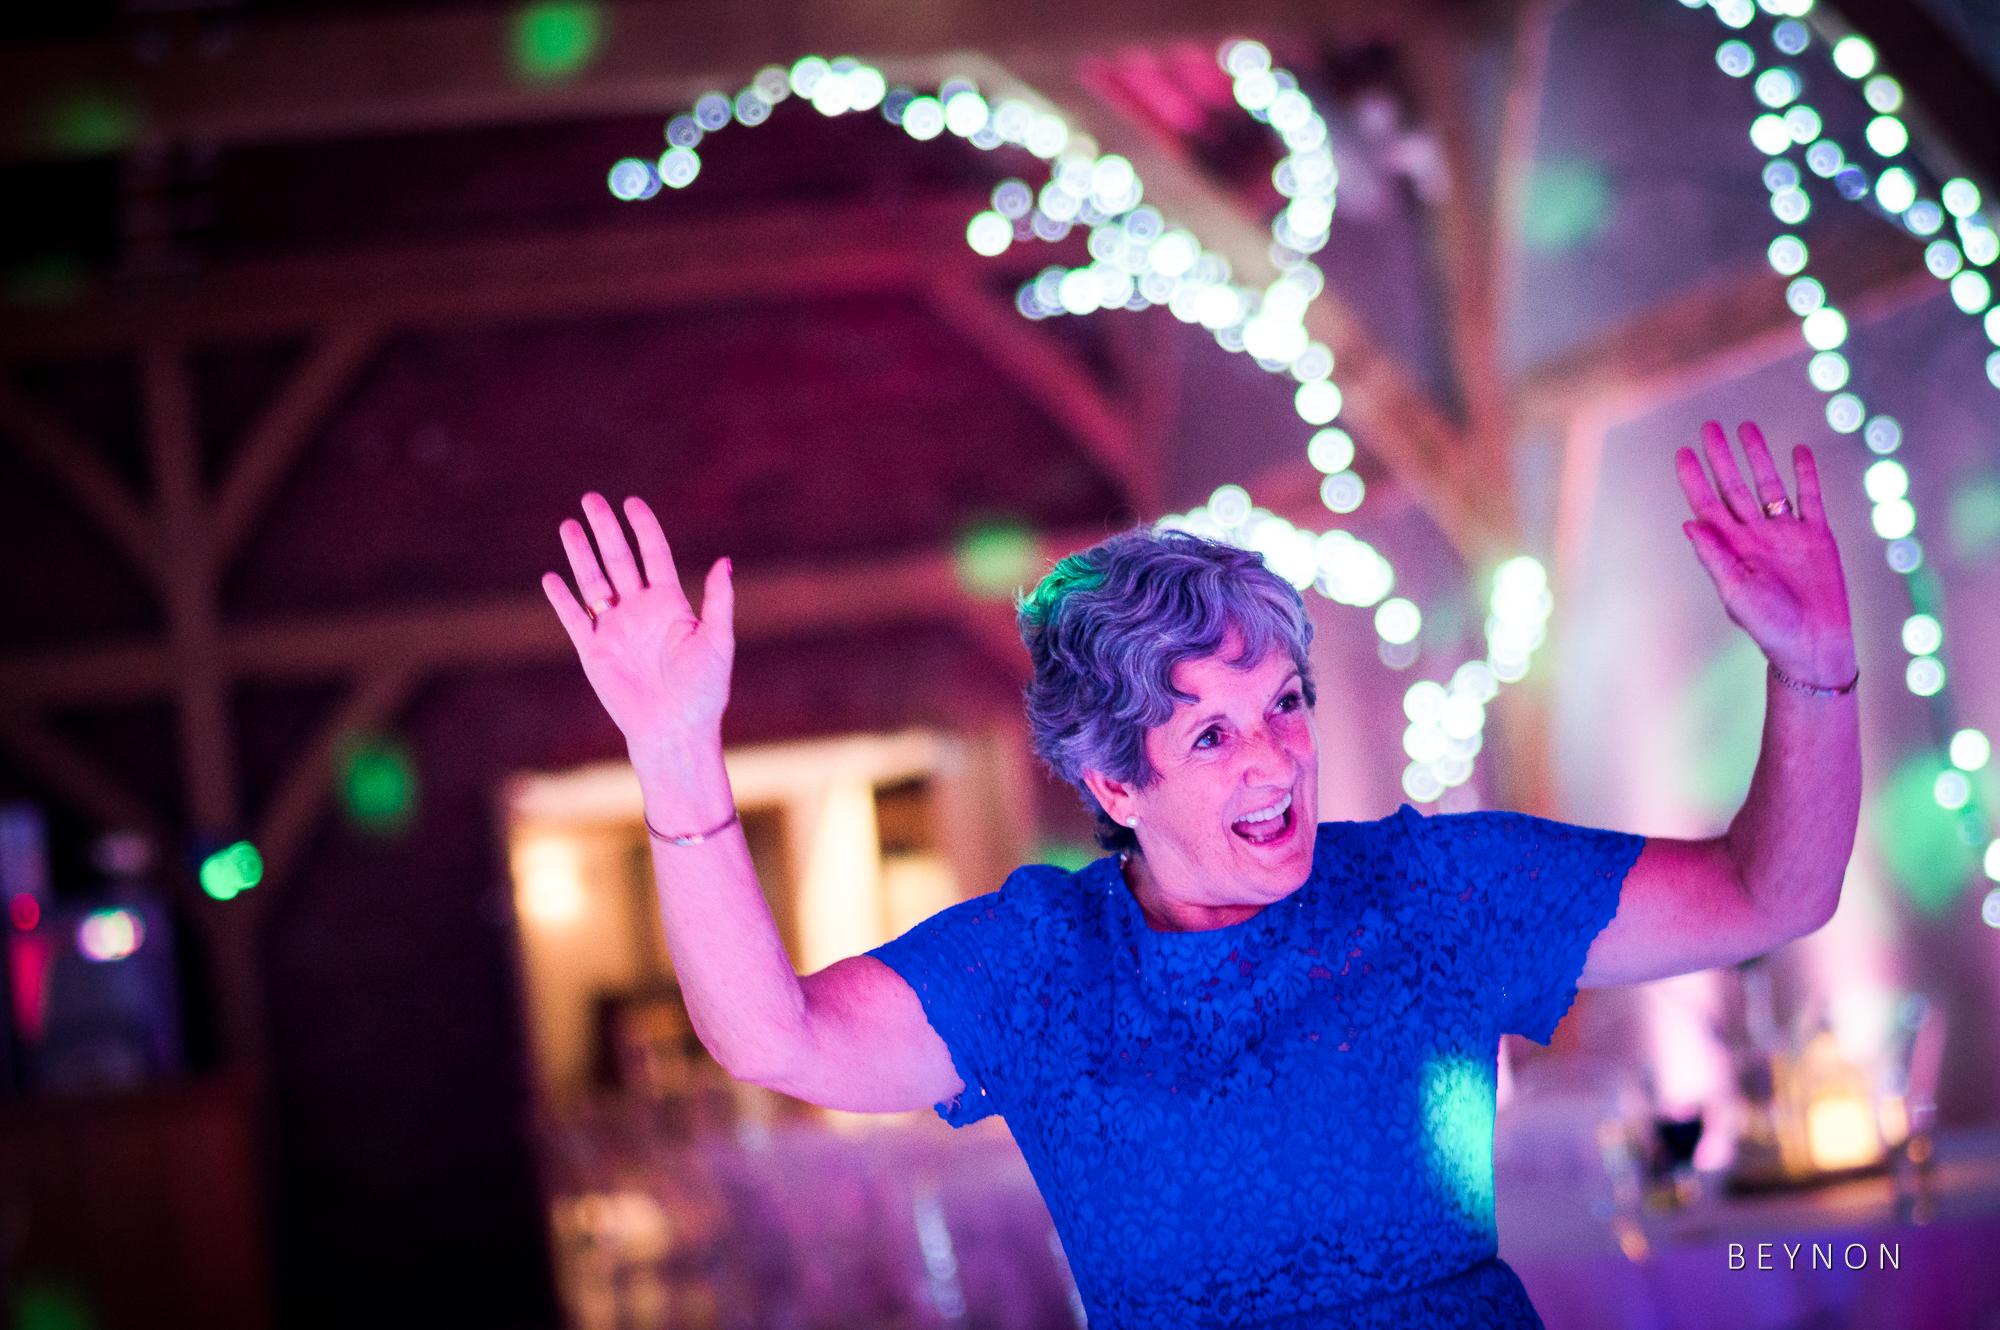 grandma on the dancefloor